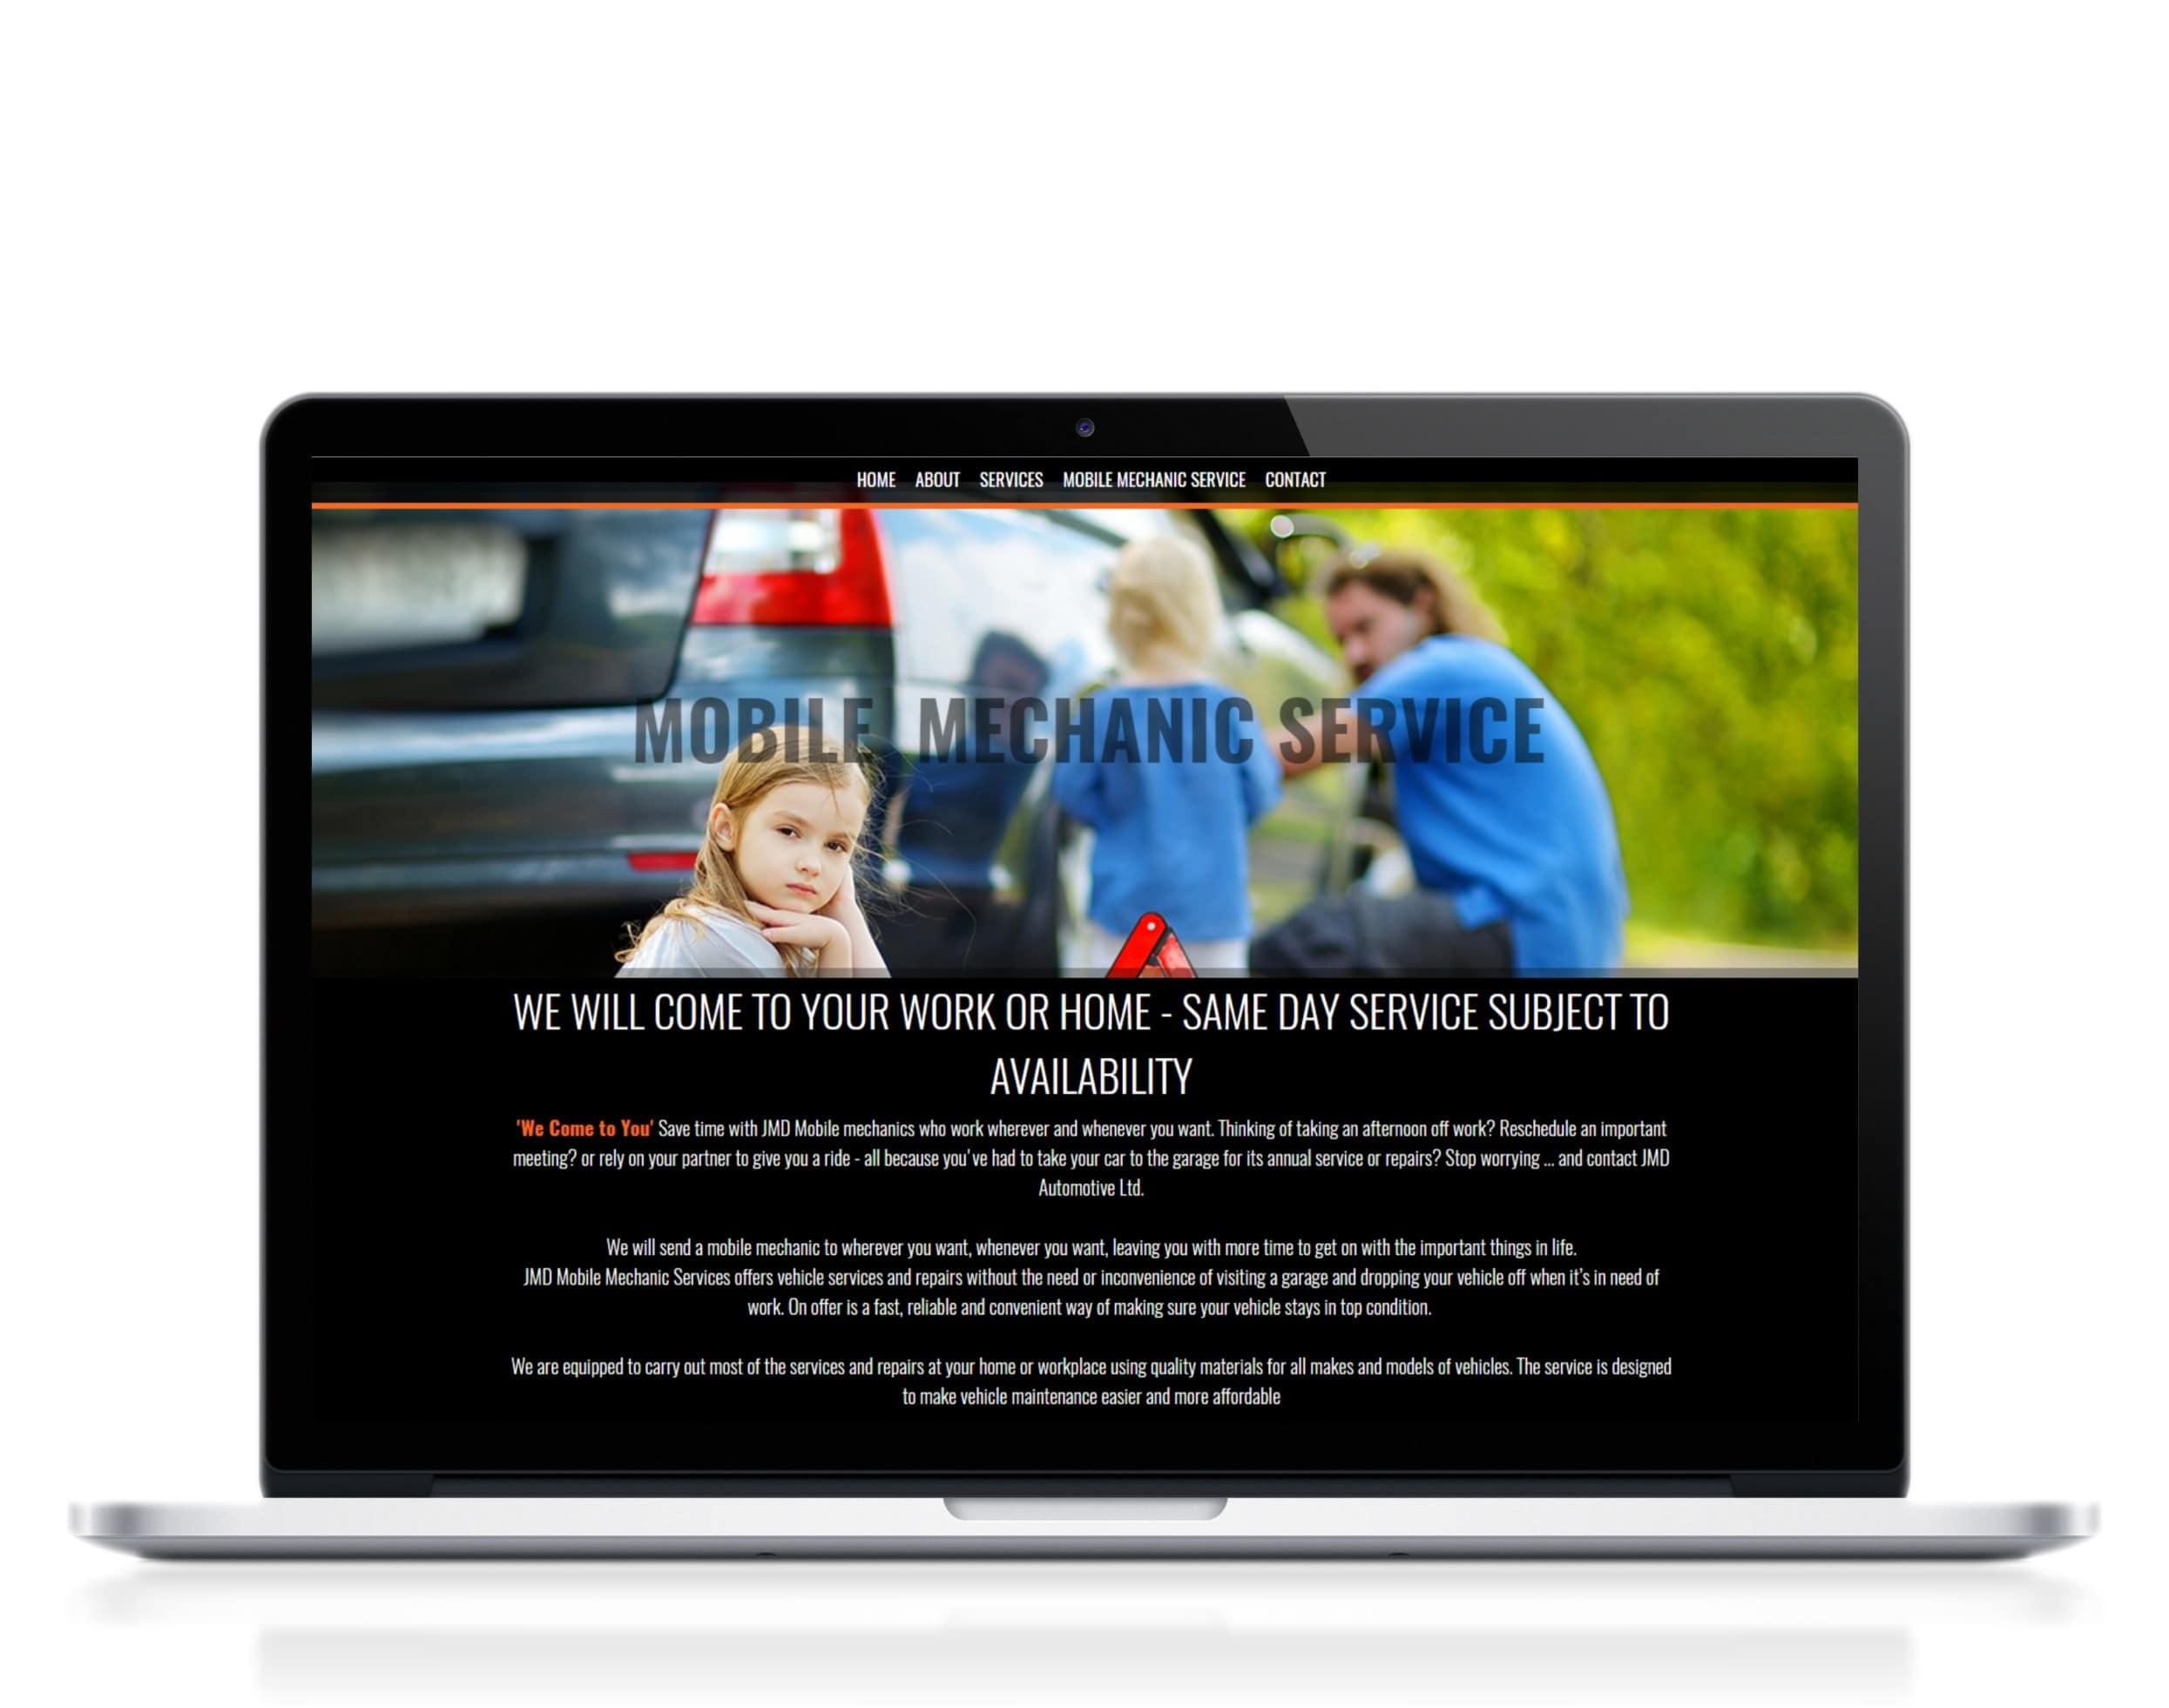 Mobile-machine-service-website